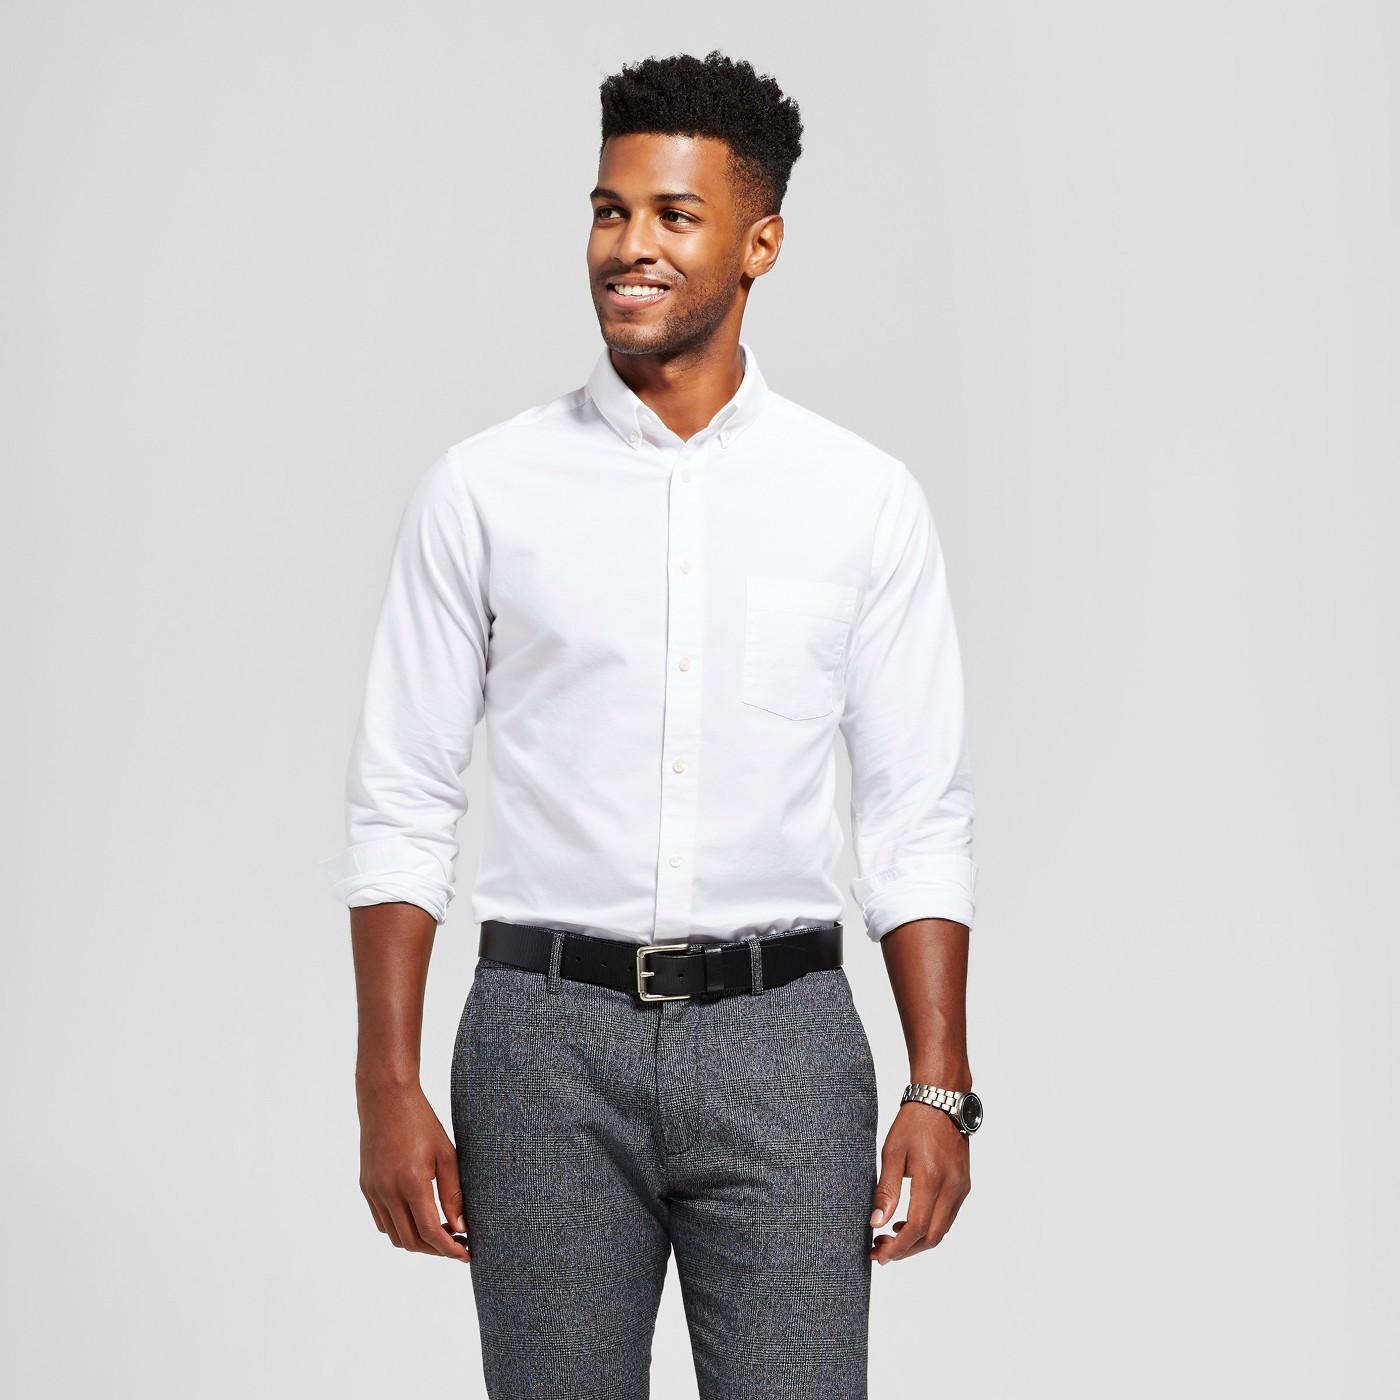 af2d4755485 Target: Goodfellow & Co. Men's Standard Fit 100% Cotton Button-Down Shirt  $12.49 (Save 50%)